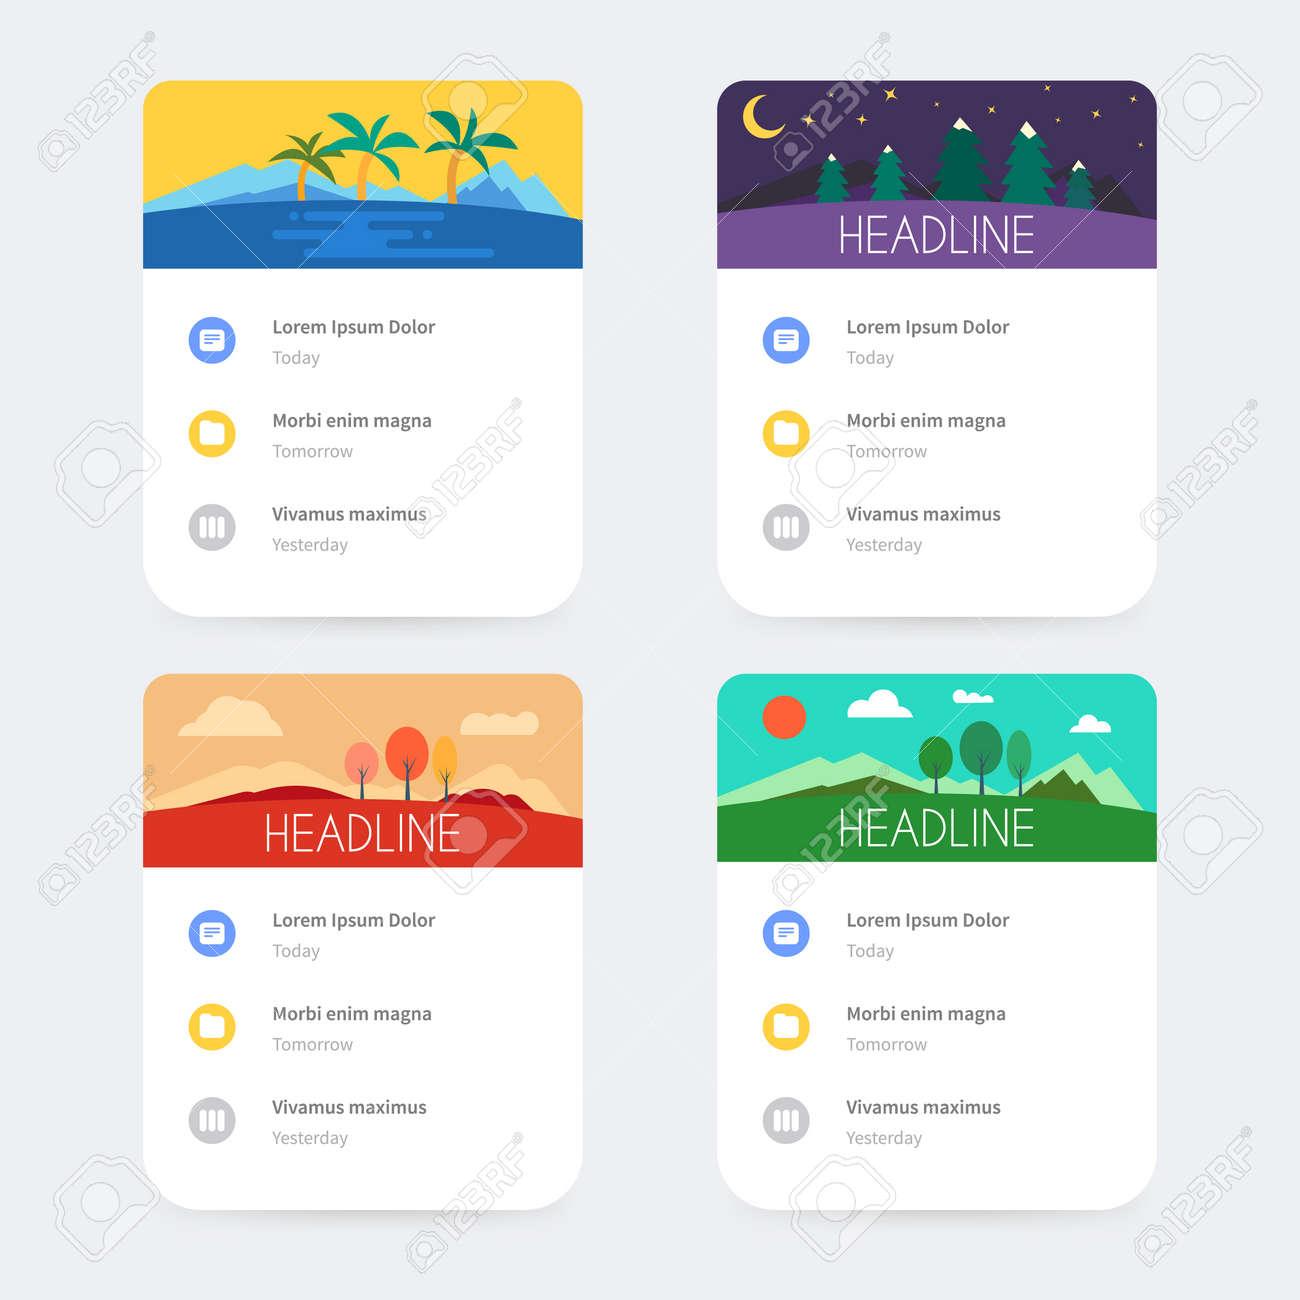 Mobile application interface design. - 49770337